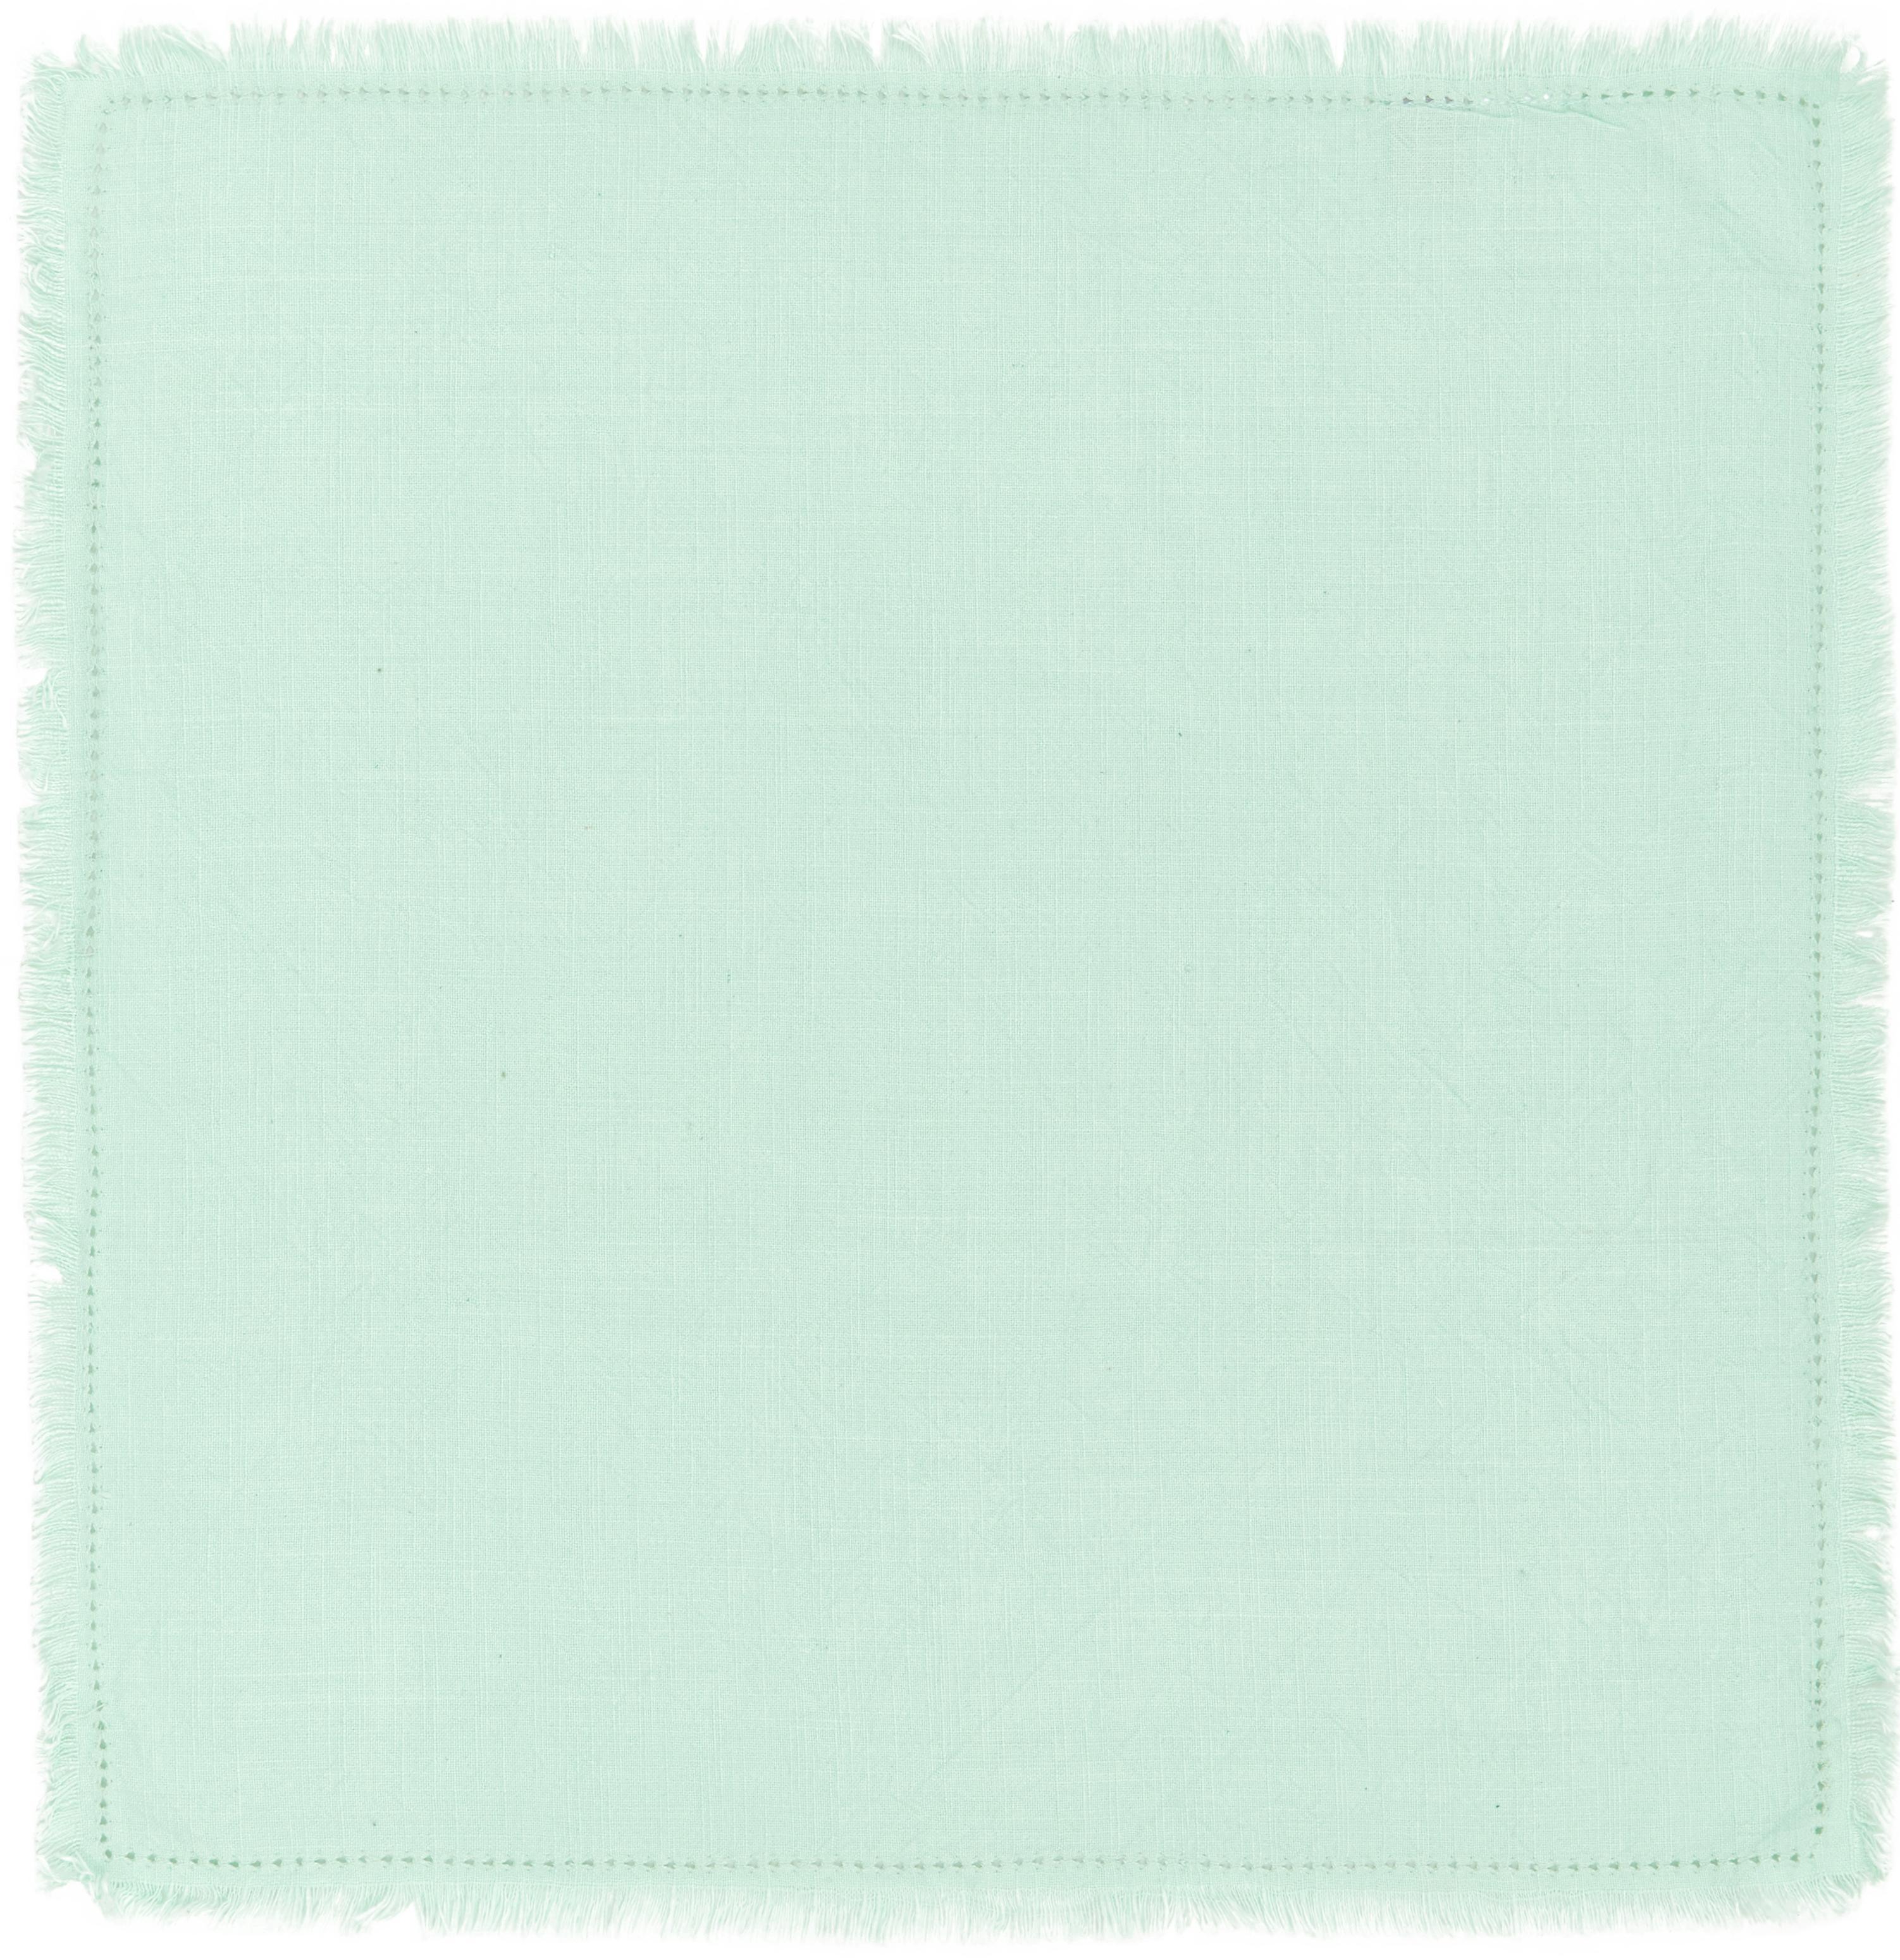 Katoenen servetten Hilma met franjes, 2 stuks, Katoen, Mintgroen, 45 x 45 cm